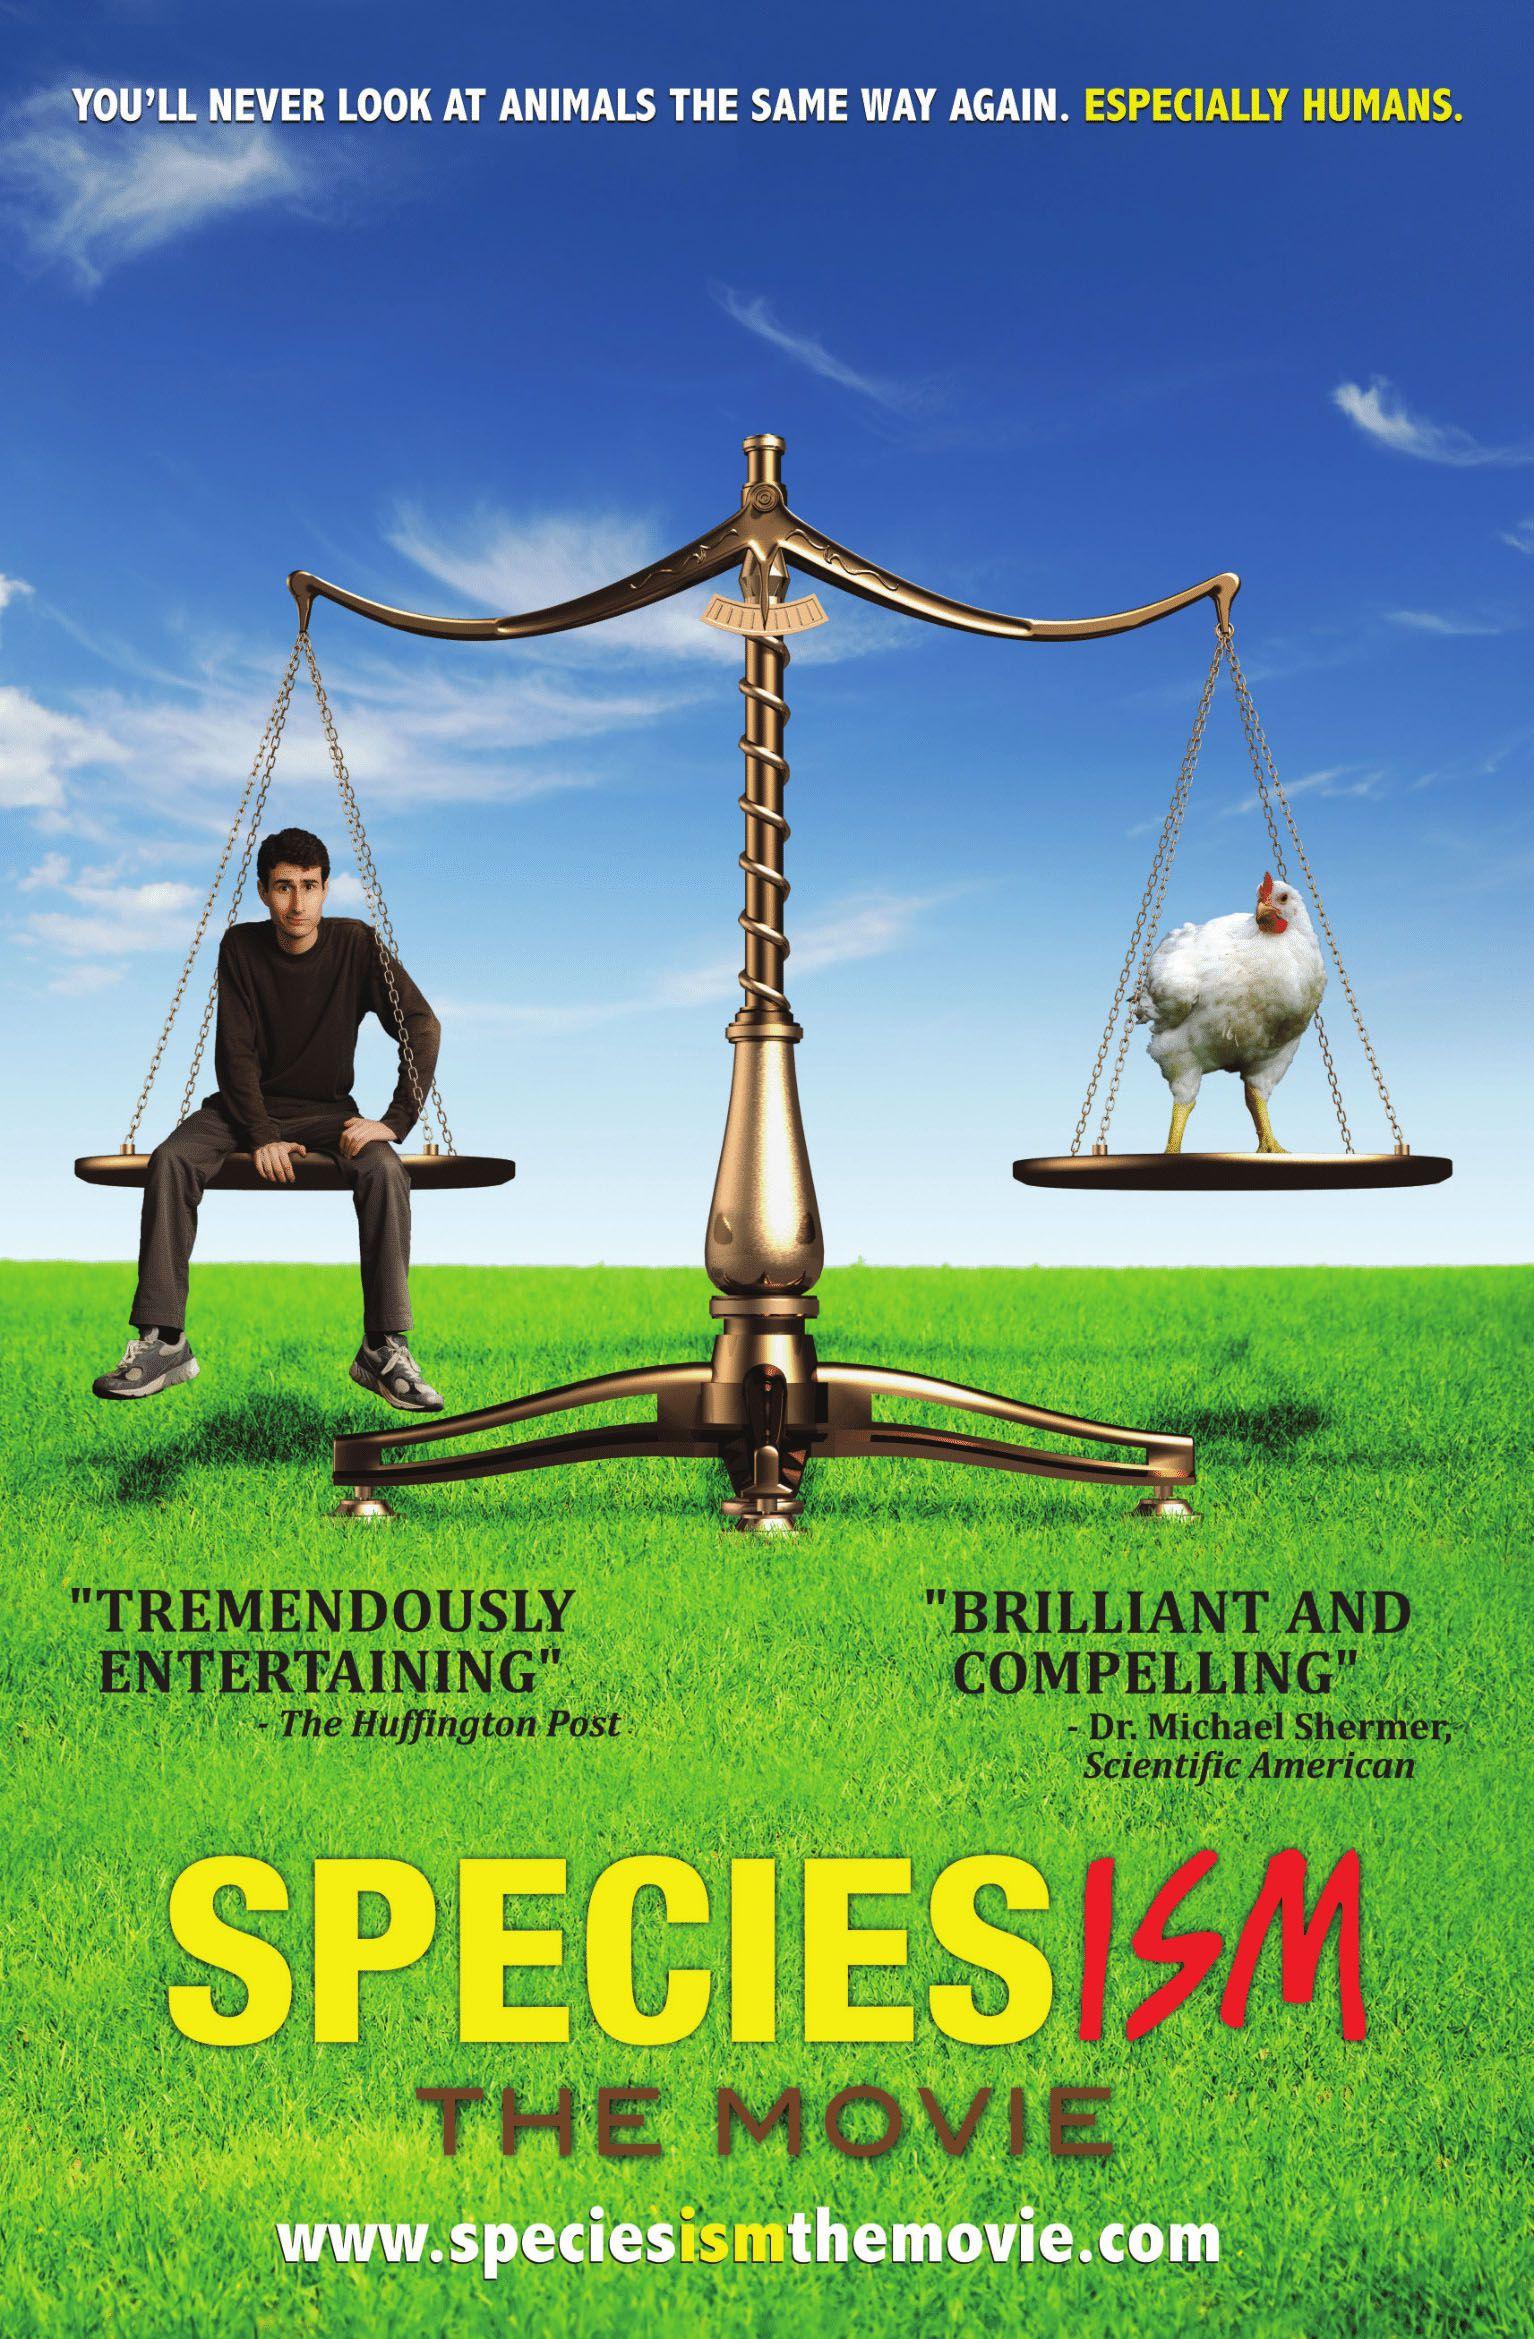 Speciesism : The Movie - Documentaire (2013)